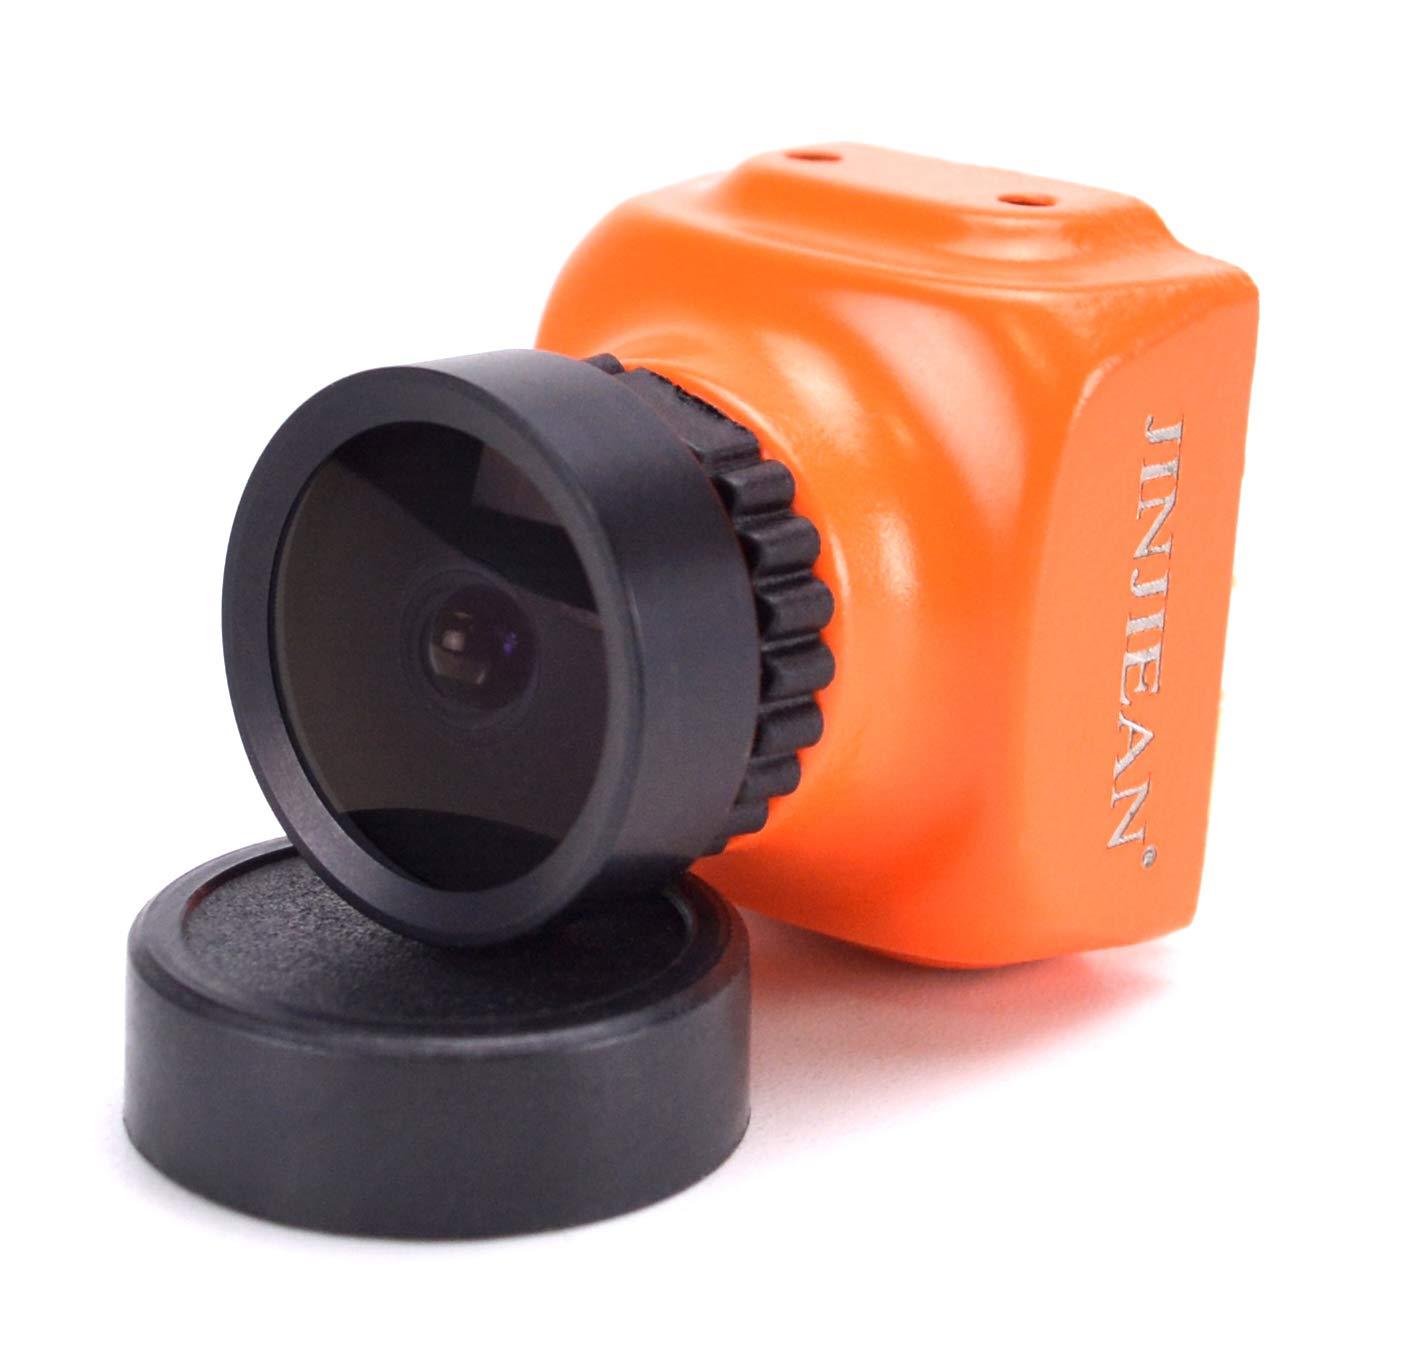 HD 1200TVL FPV Camera CMOS NTSC 2.8mm Lens Mini CCTV Security Video Camera for FPV Quadcopter ZMR250 FPVDrone